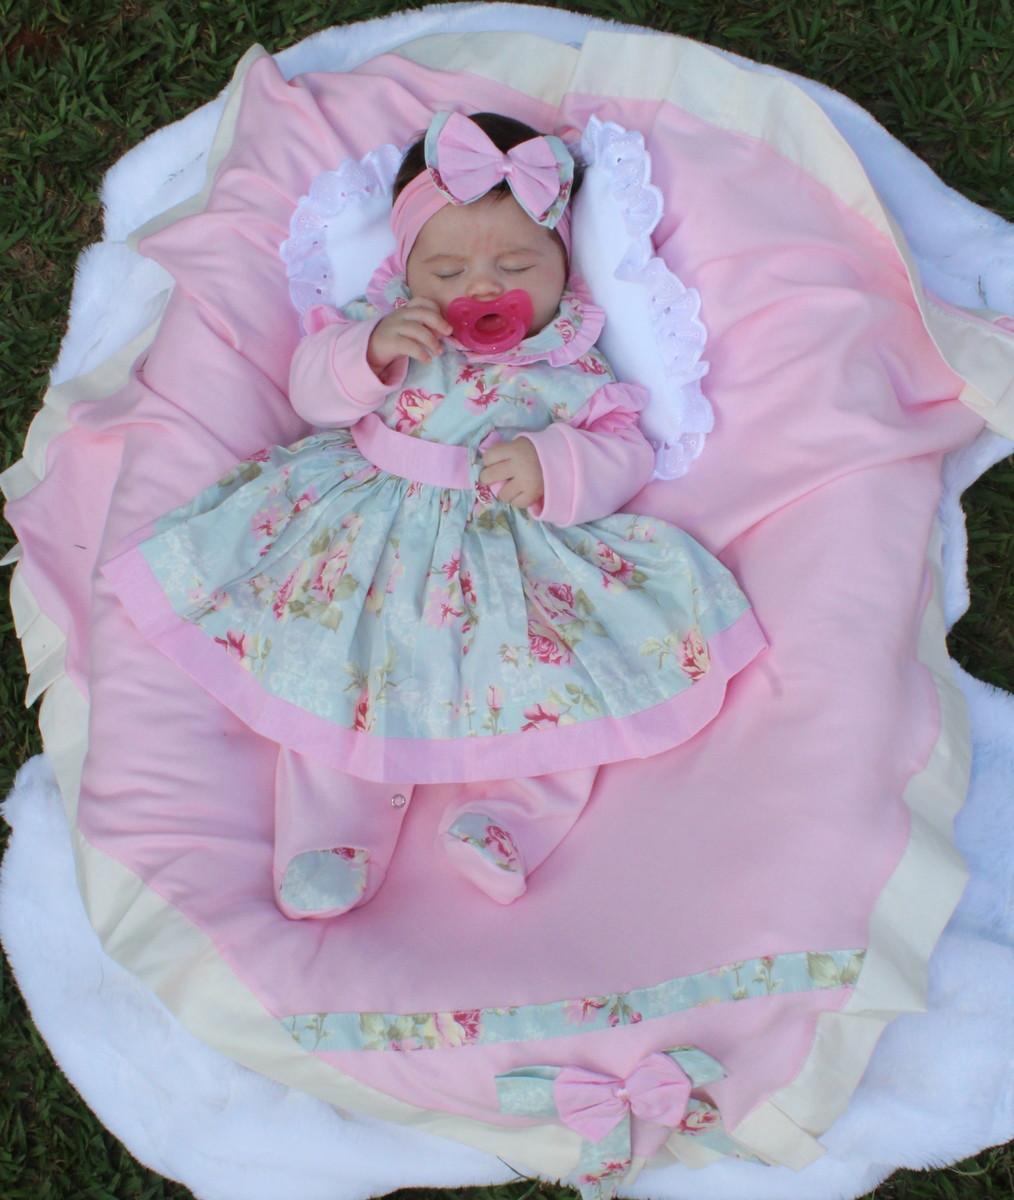 Saída Maternidade Menina Charmosa 5 peças Esmeralda Cor 2 no Elo7 ... 872315d3997